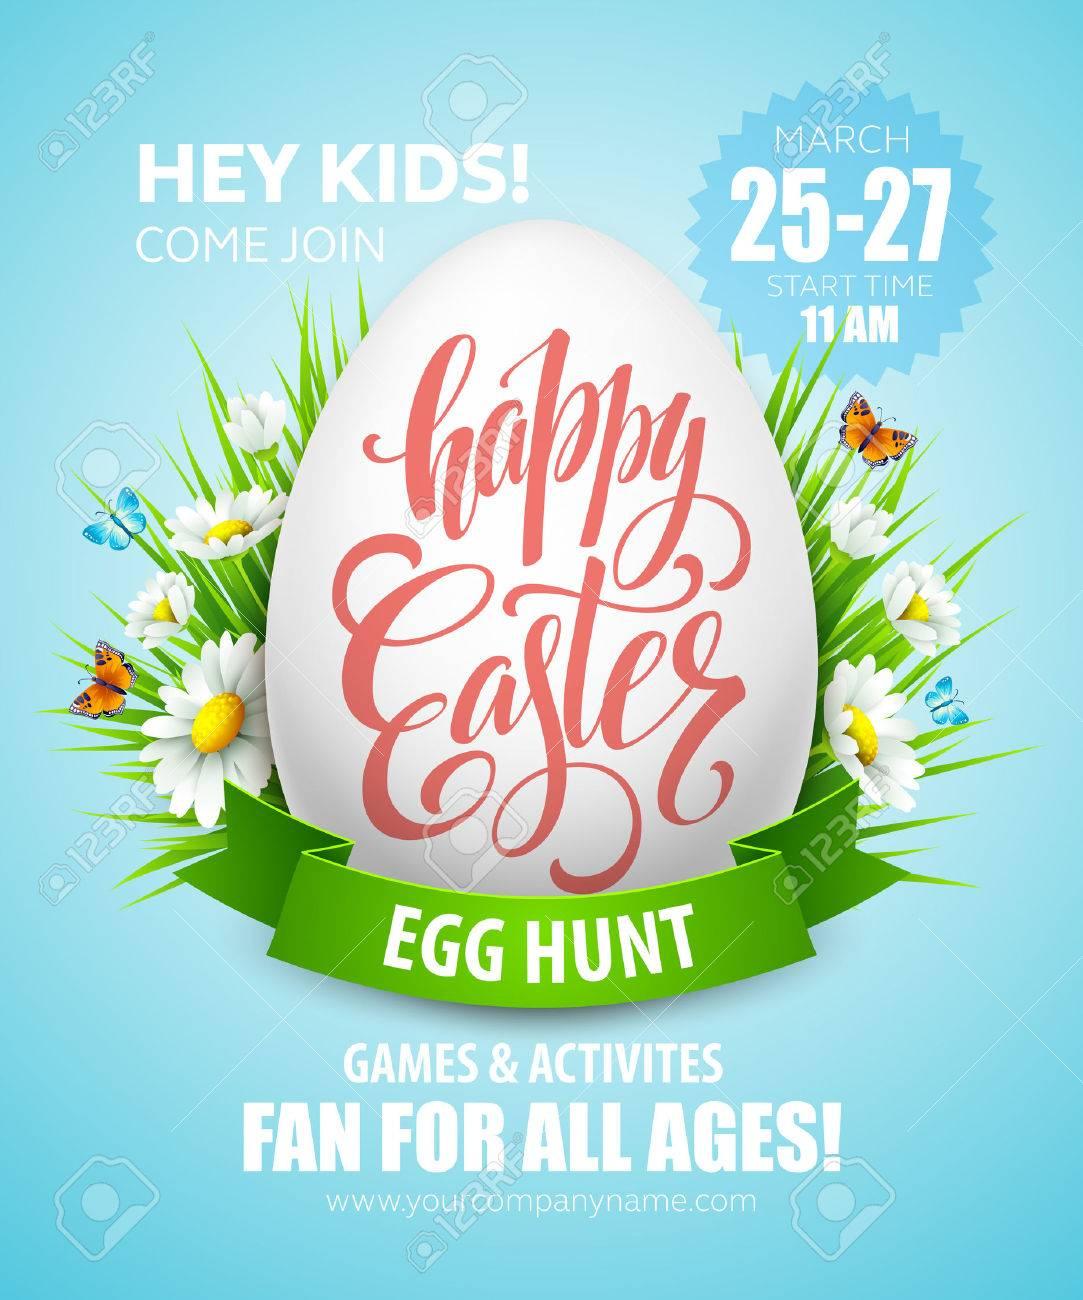 Easter Egg Hunt poster. Vector illustration EPS10 - 52029006